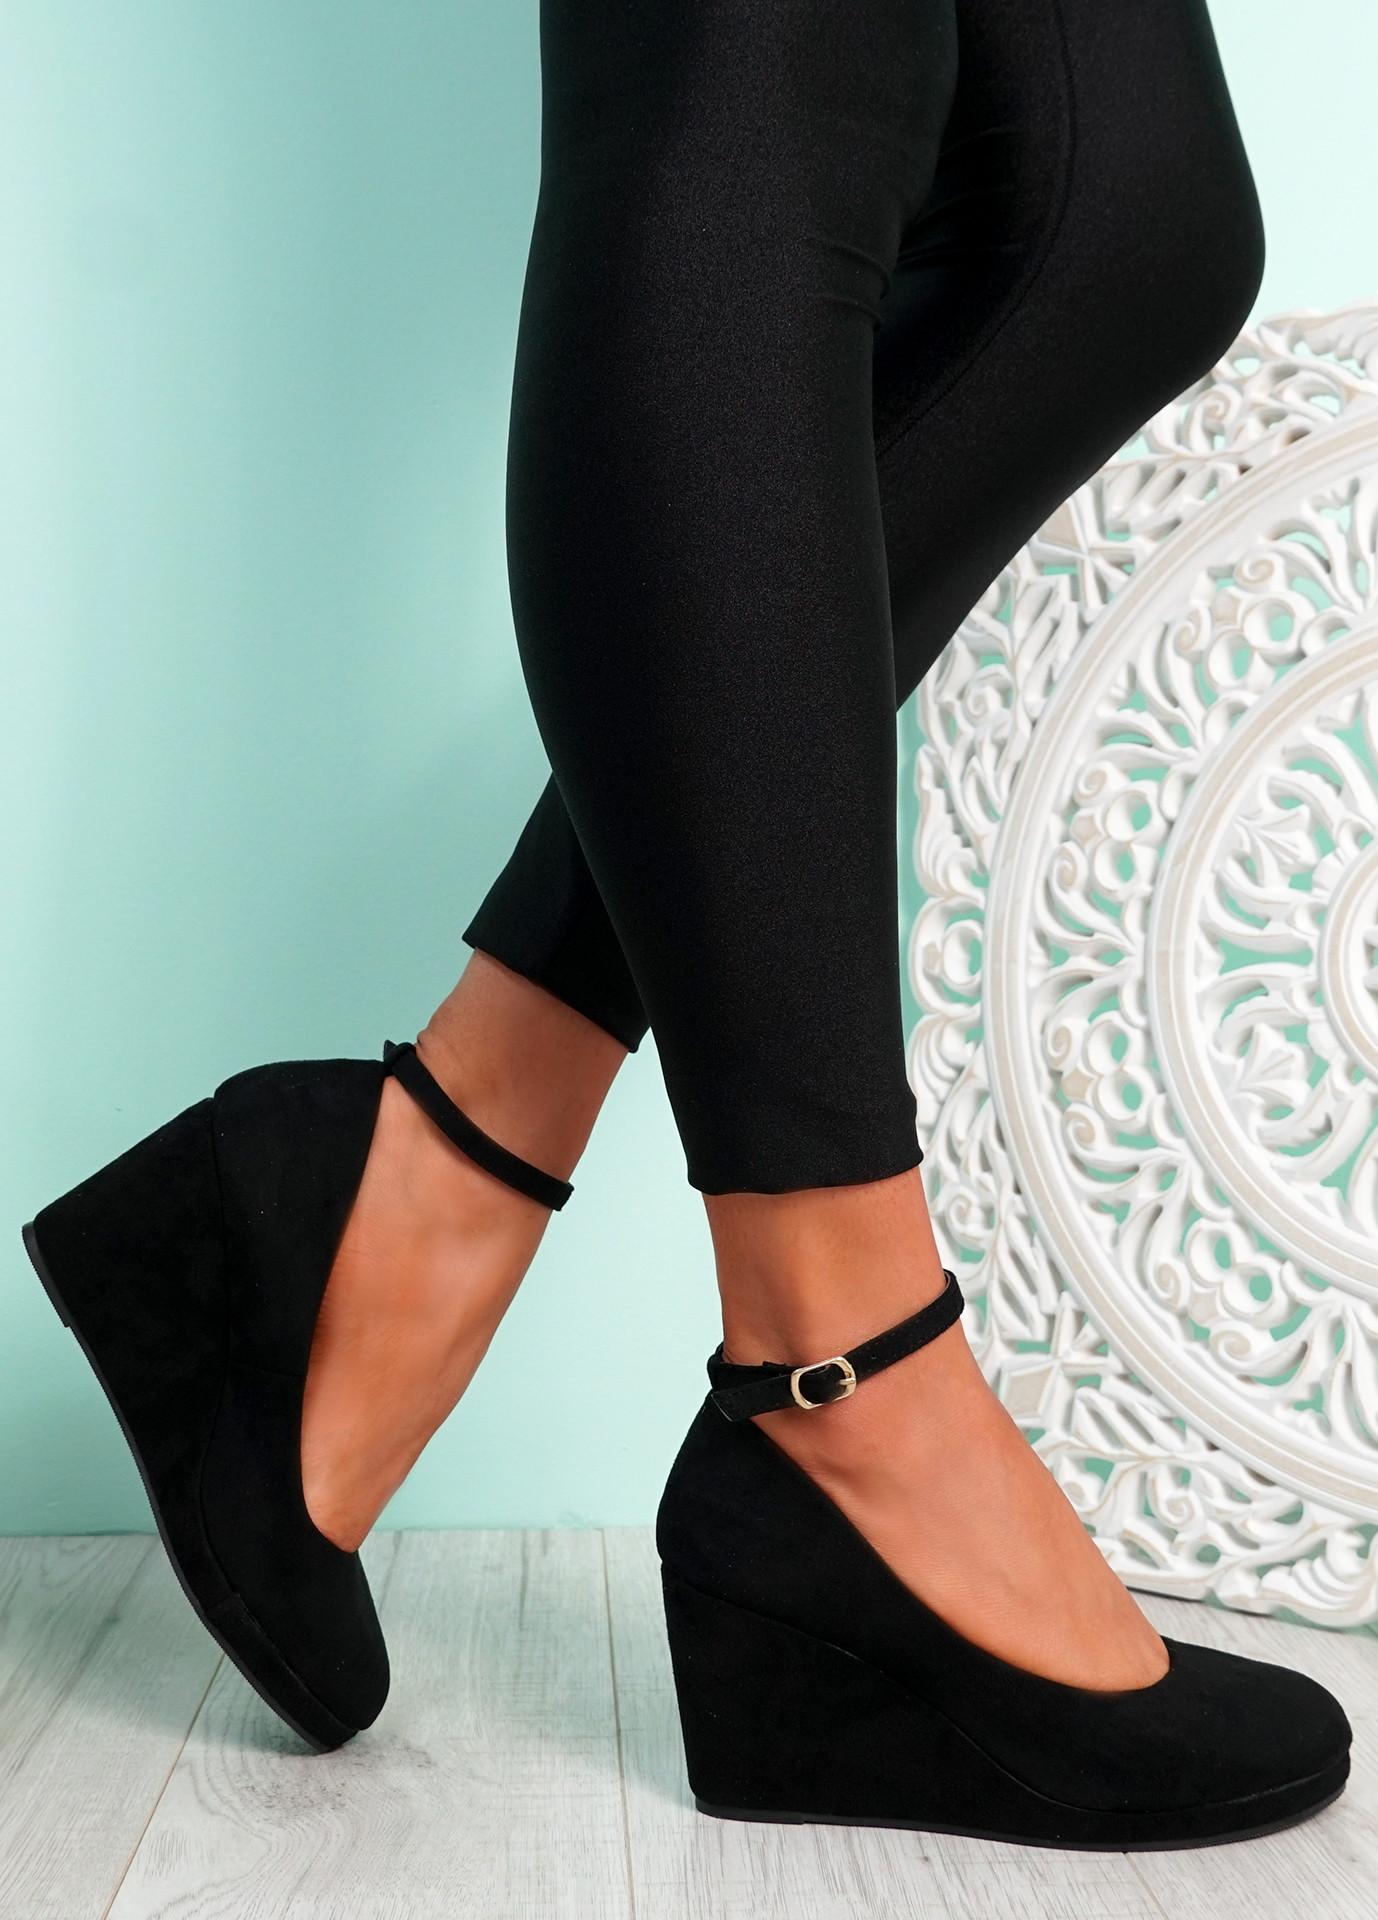 Lorene Black Suede Wedge Pumps Sandals